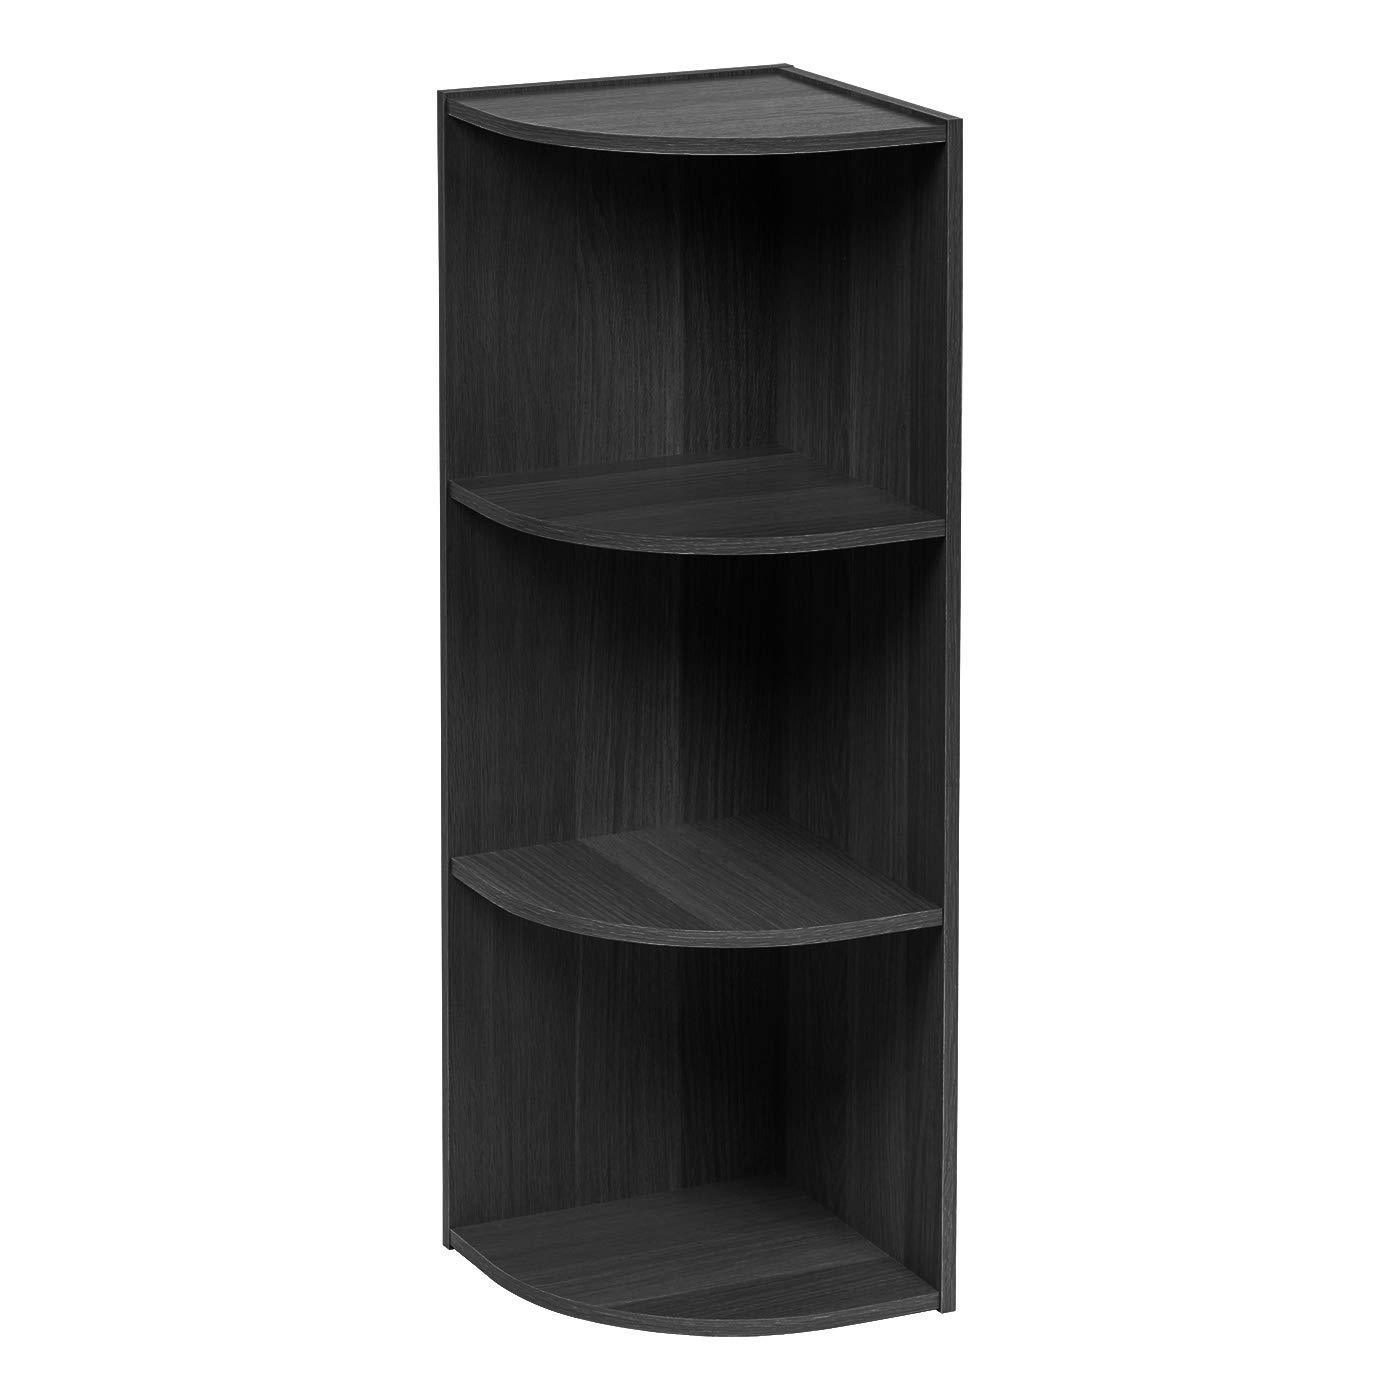 IRIS USA 596491 3-Tier Corner Curved Shelf Organizer, Black